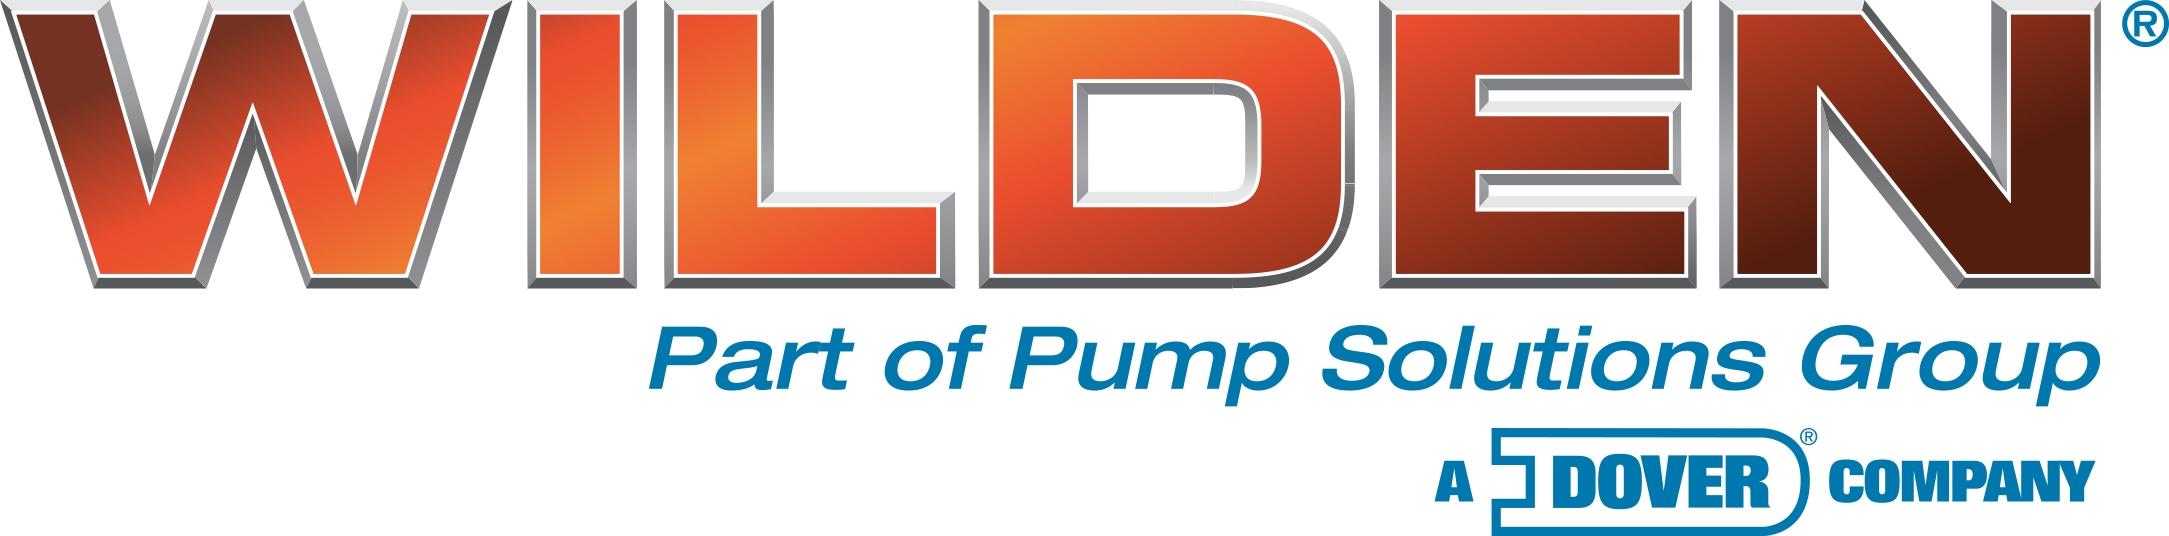 Wilden air operated double diaphragm pumps at el paso phoenix pumps wilden publicscrutiny Images